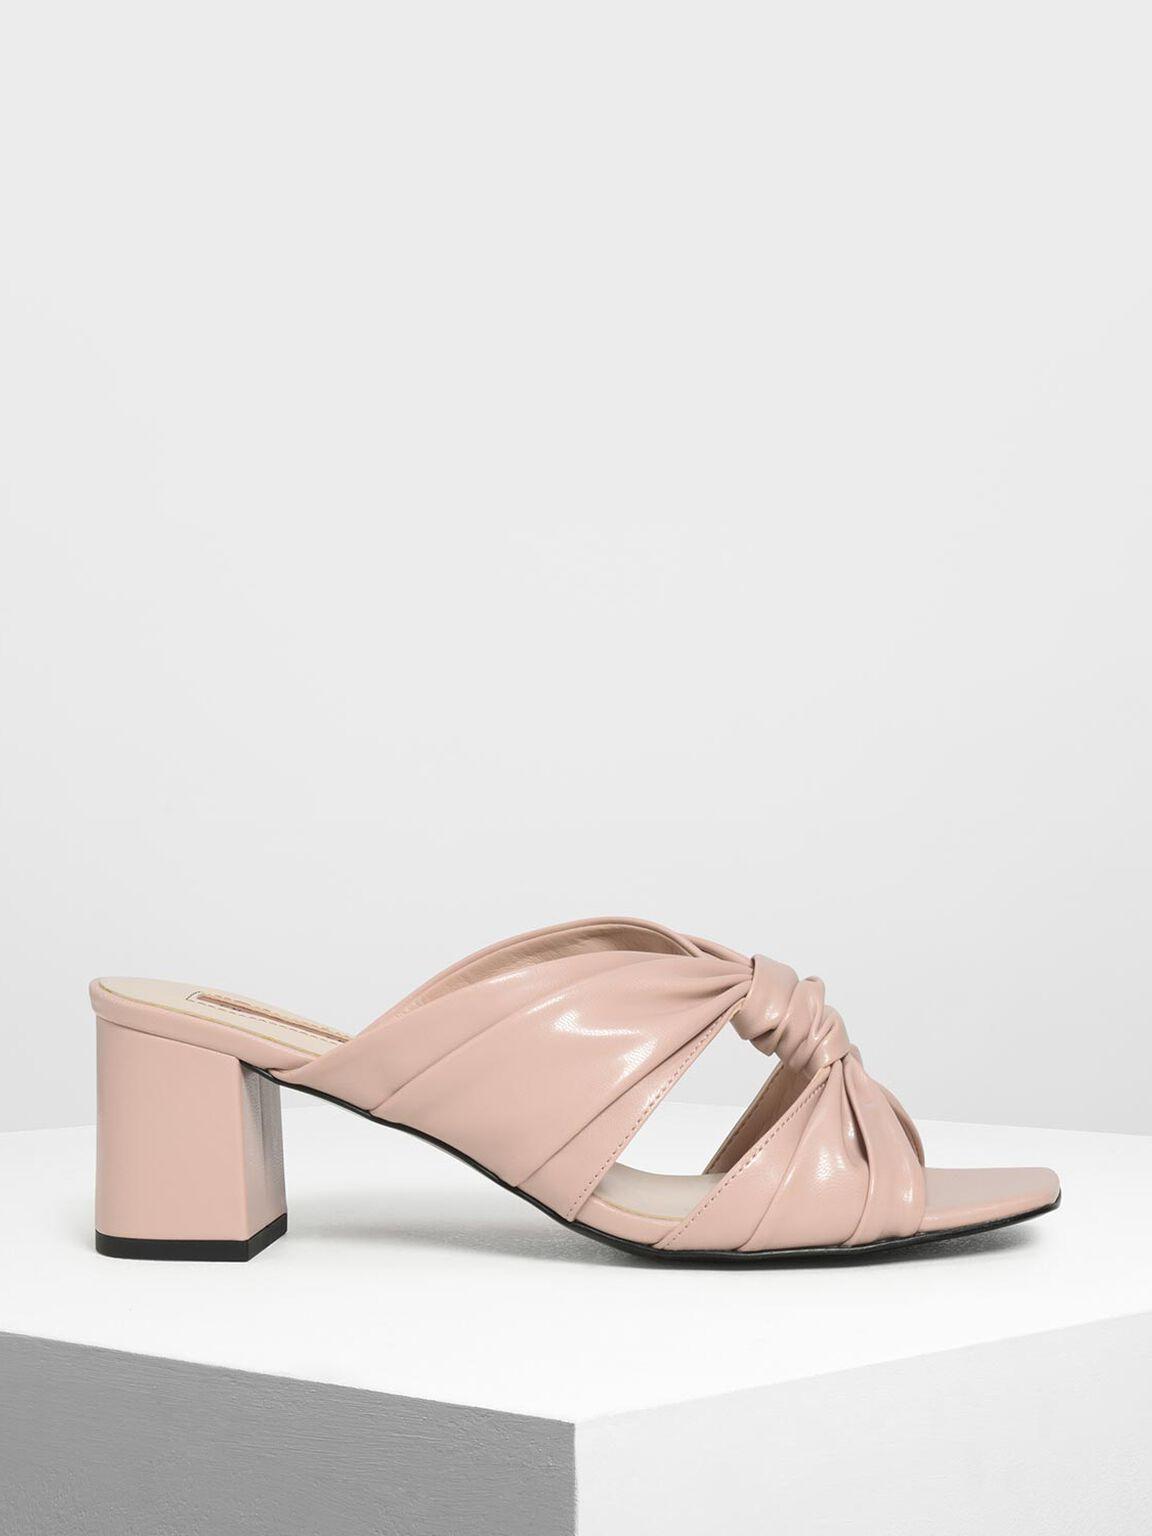 Ruched Block Heel Slide Sandals, Nude, hi-res